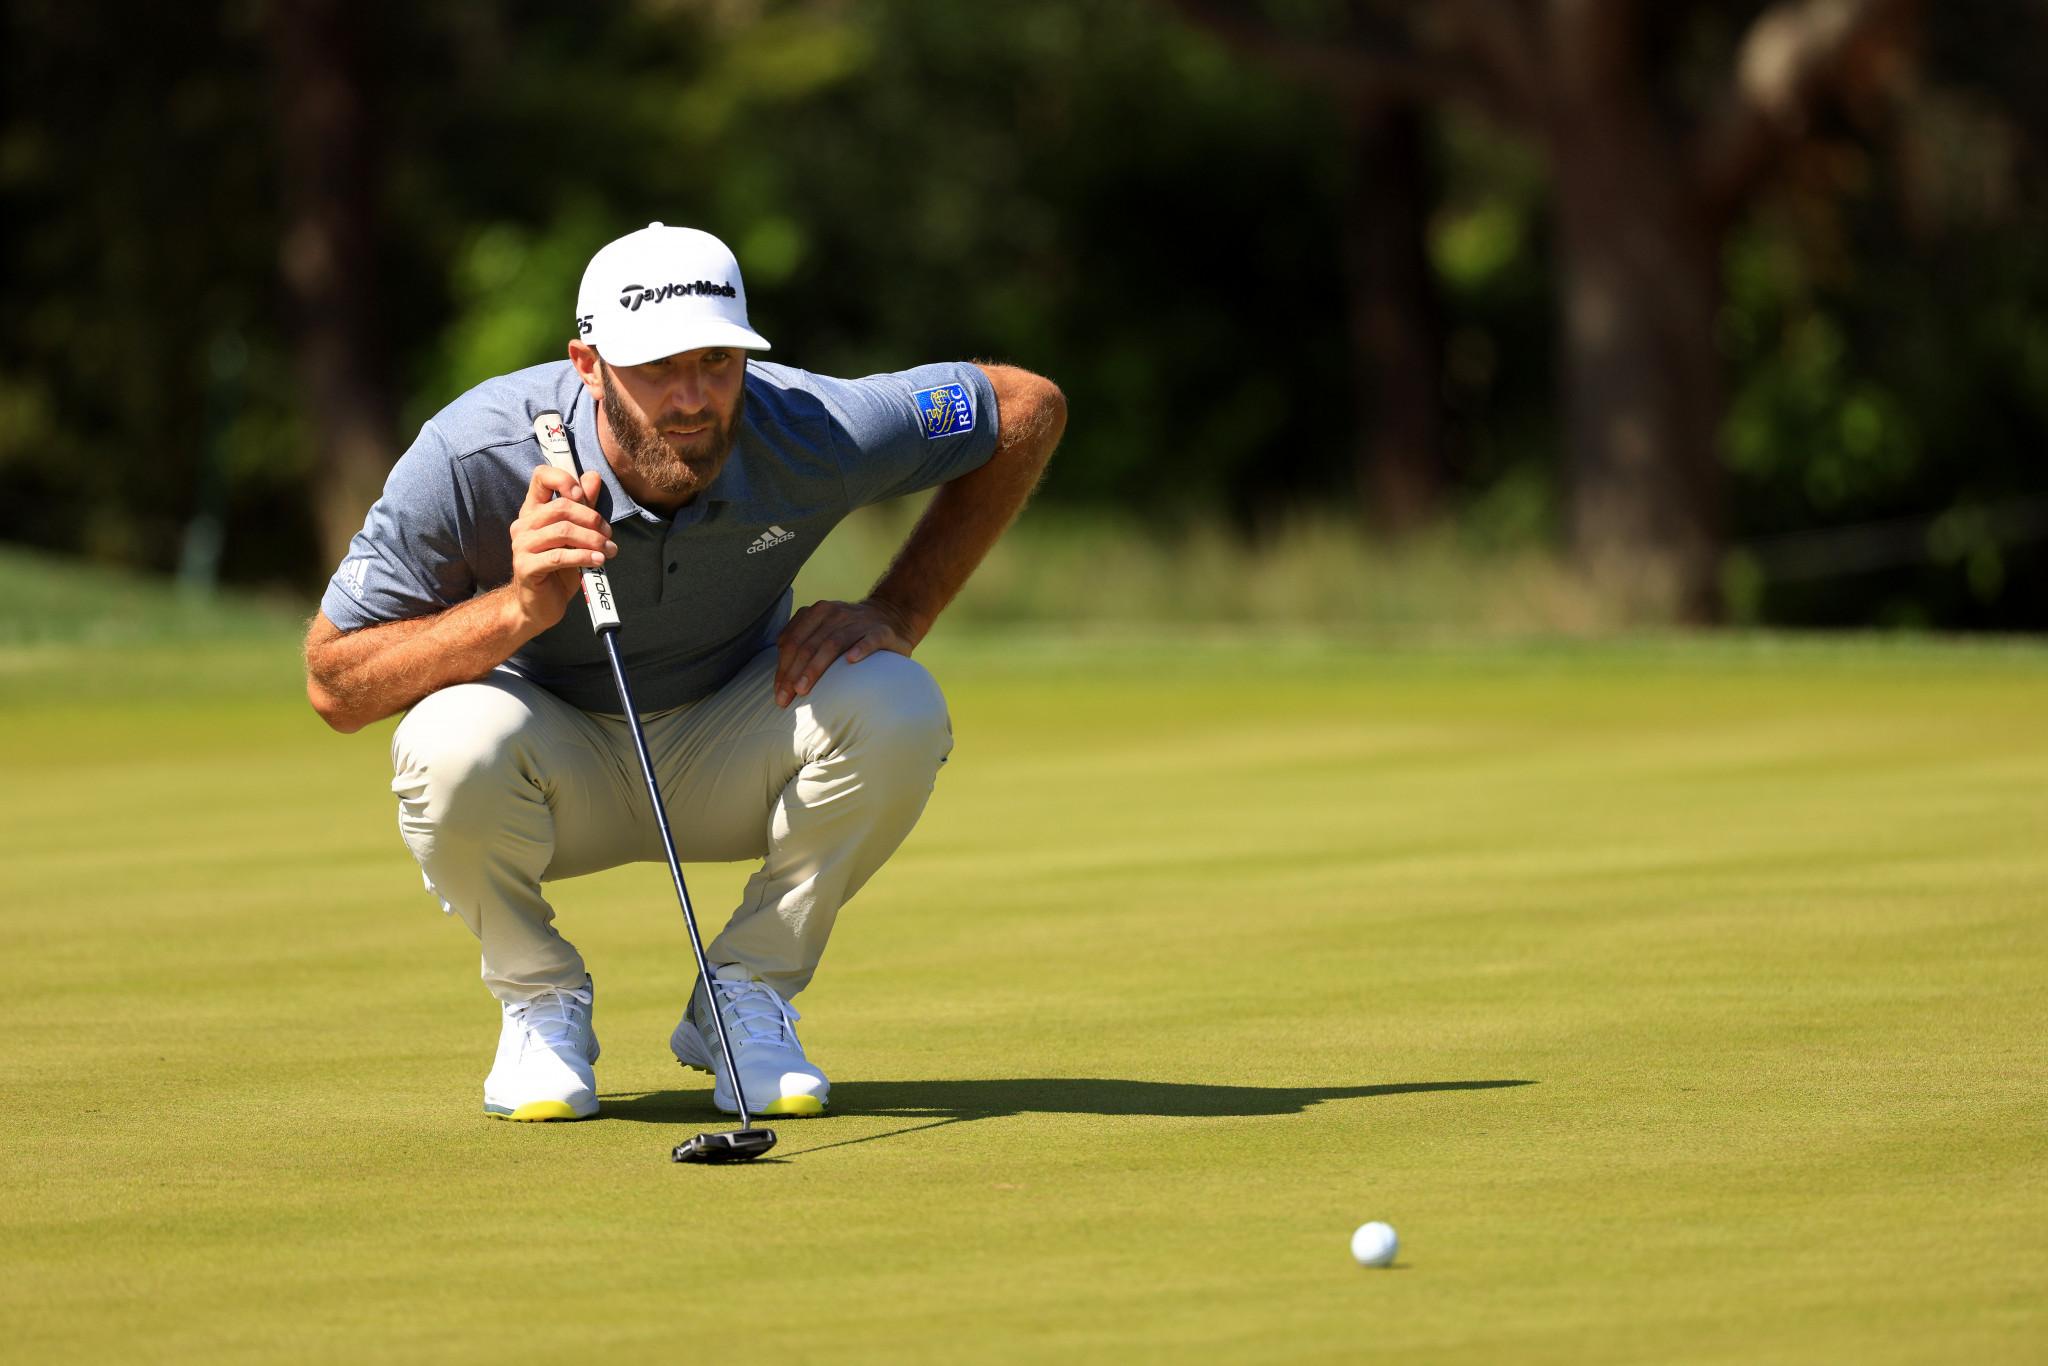 Masters golf champion Johnson confirms plan to skip Tokyo 2020 Olympics